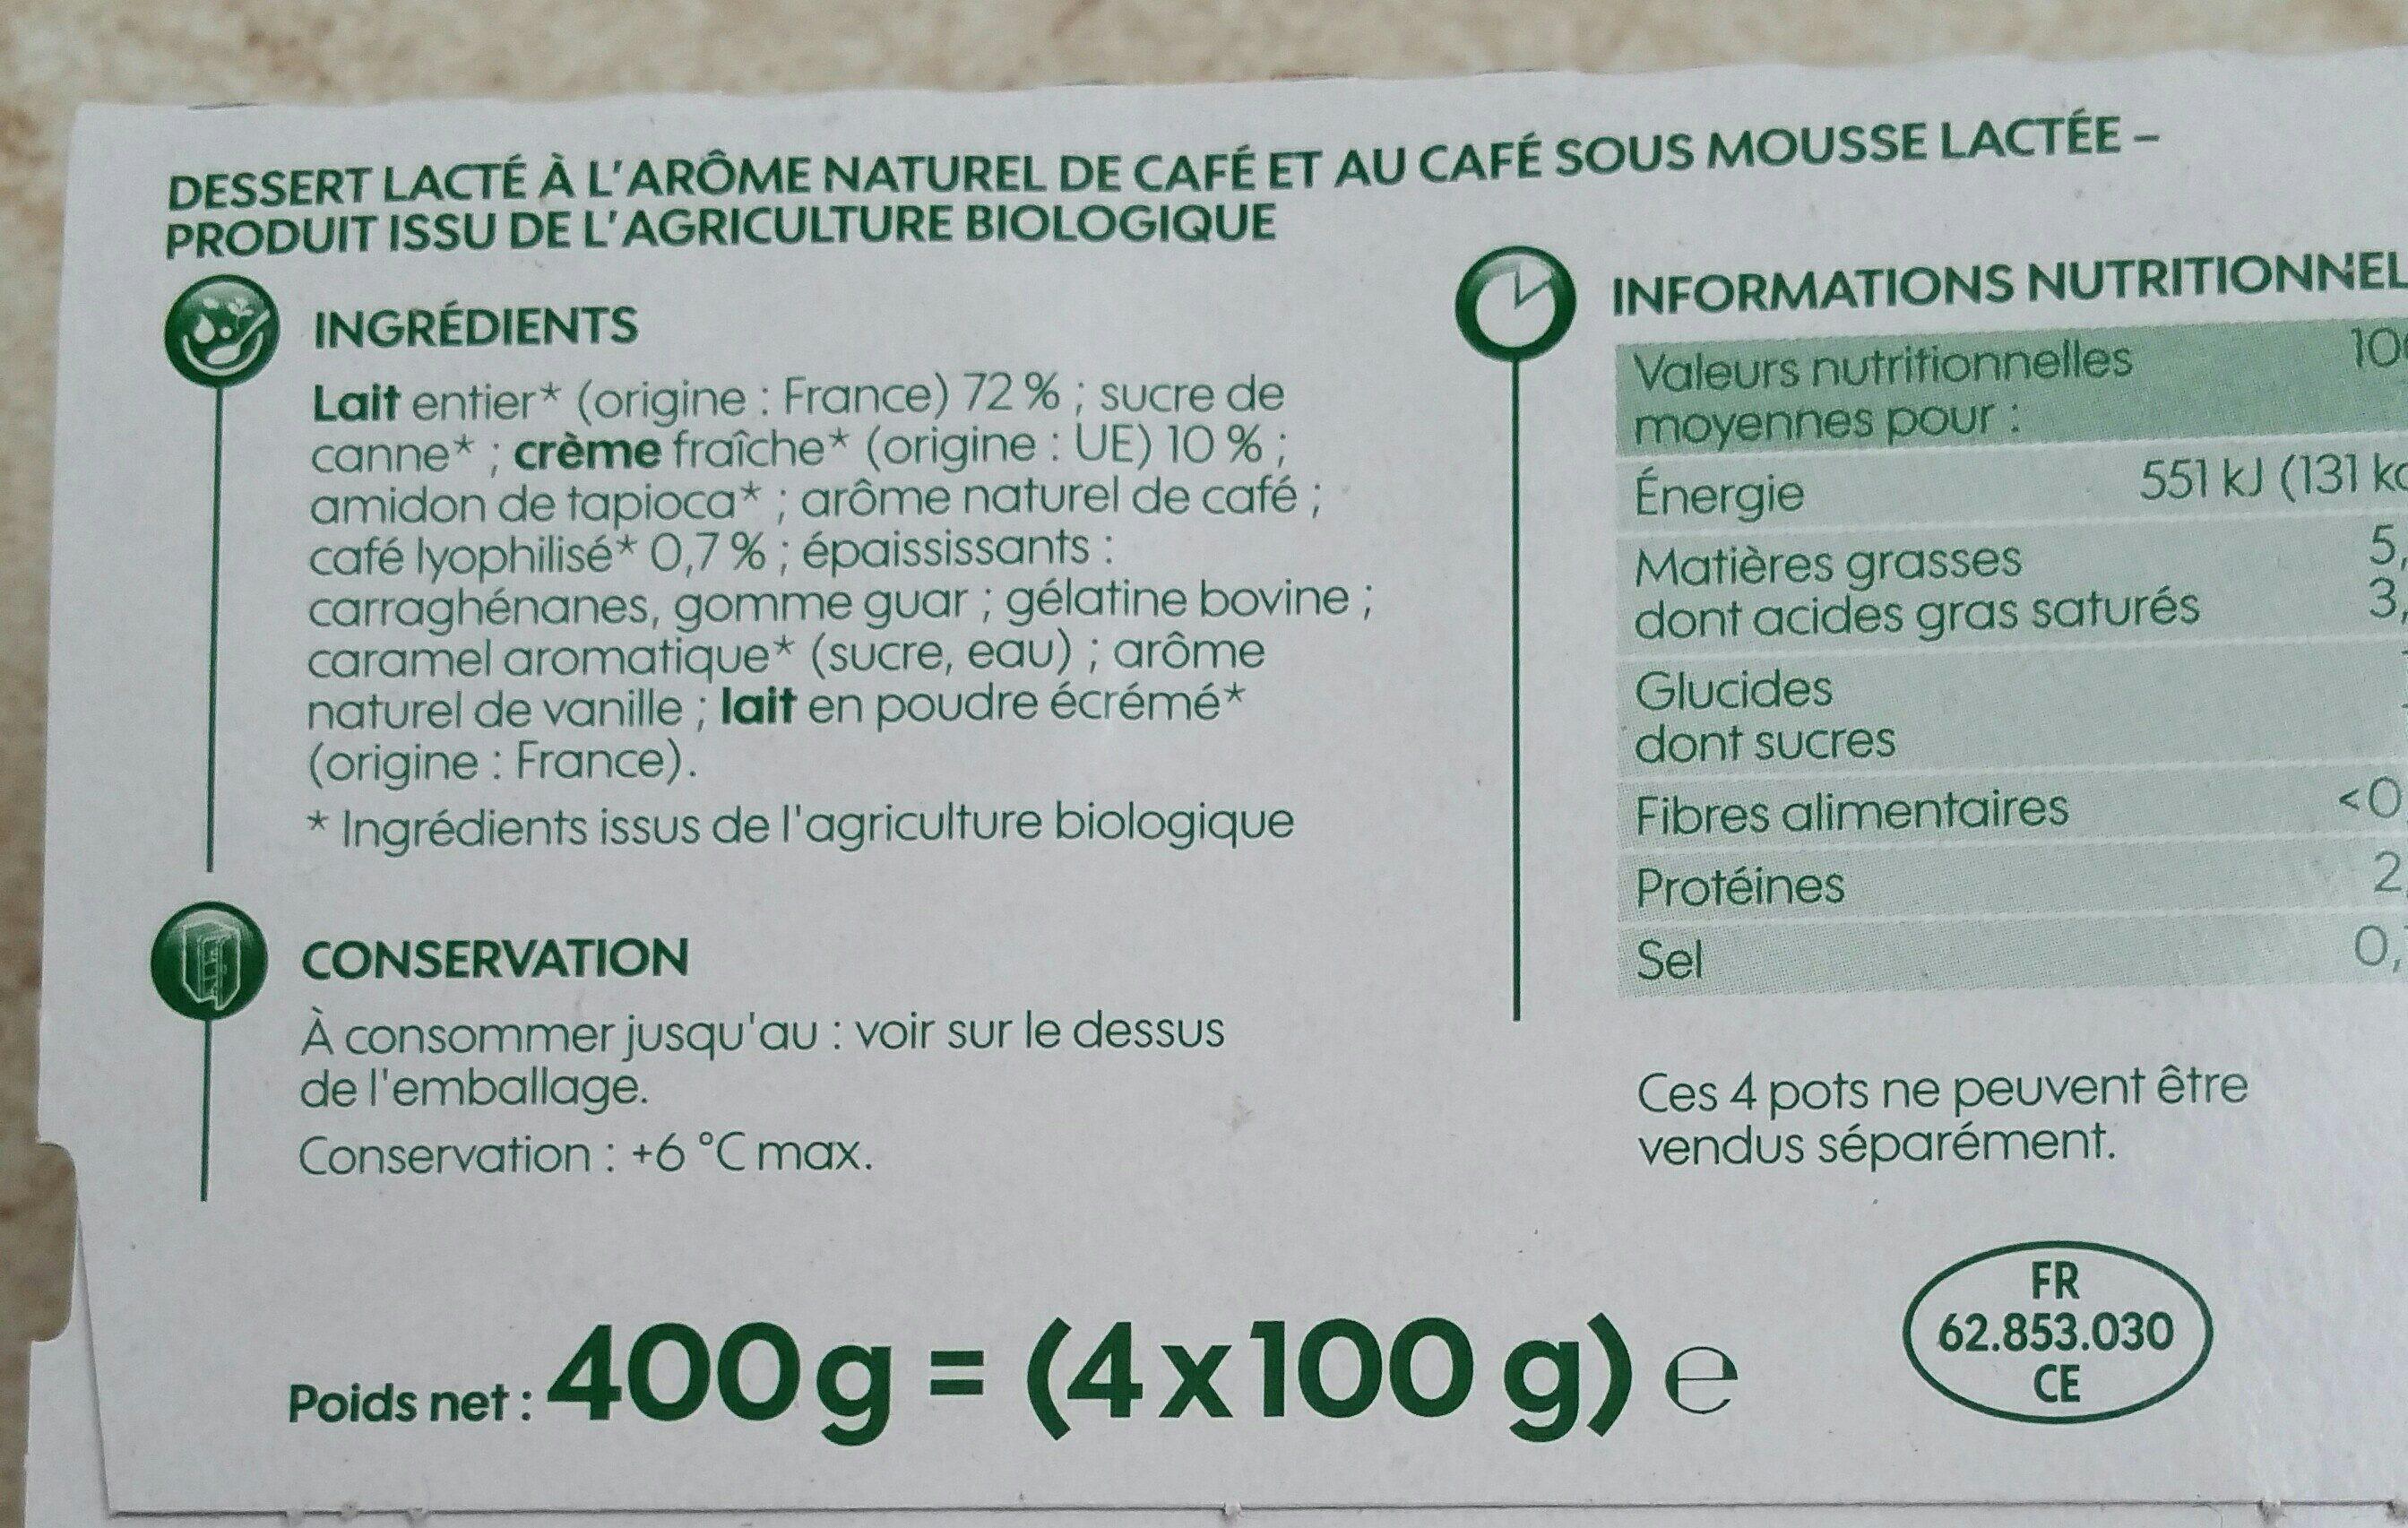 Liégeois café bio - Ingrediënten - fr